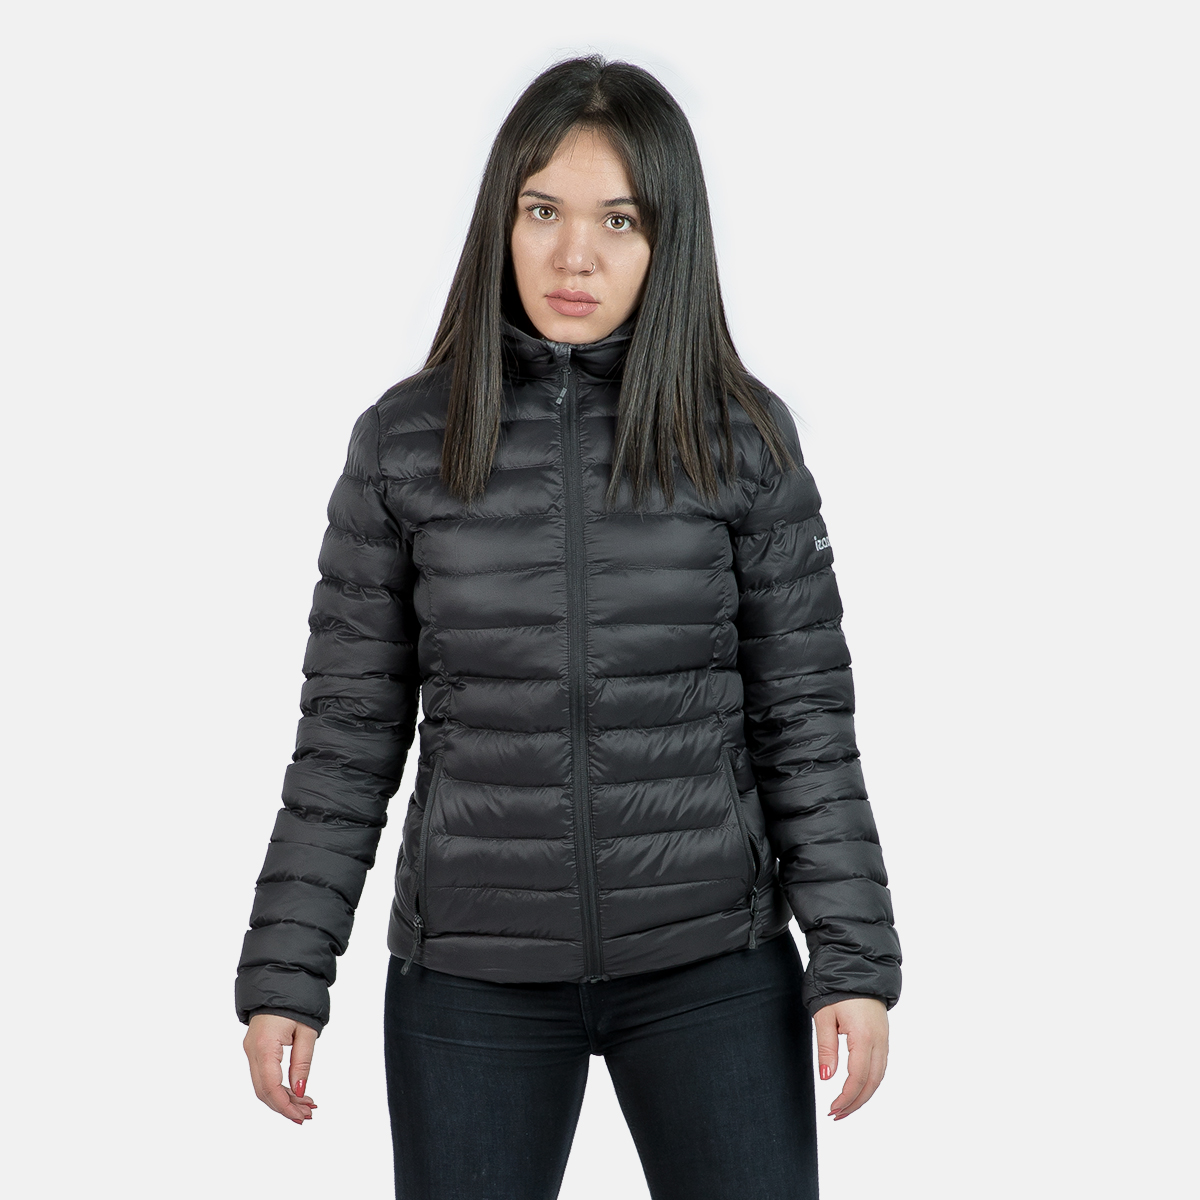 WOMAN'S AILAMA MOUNT-LOFT PADDED BLACK